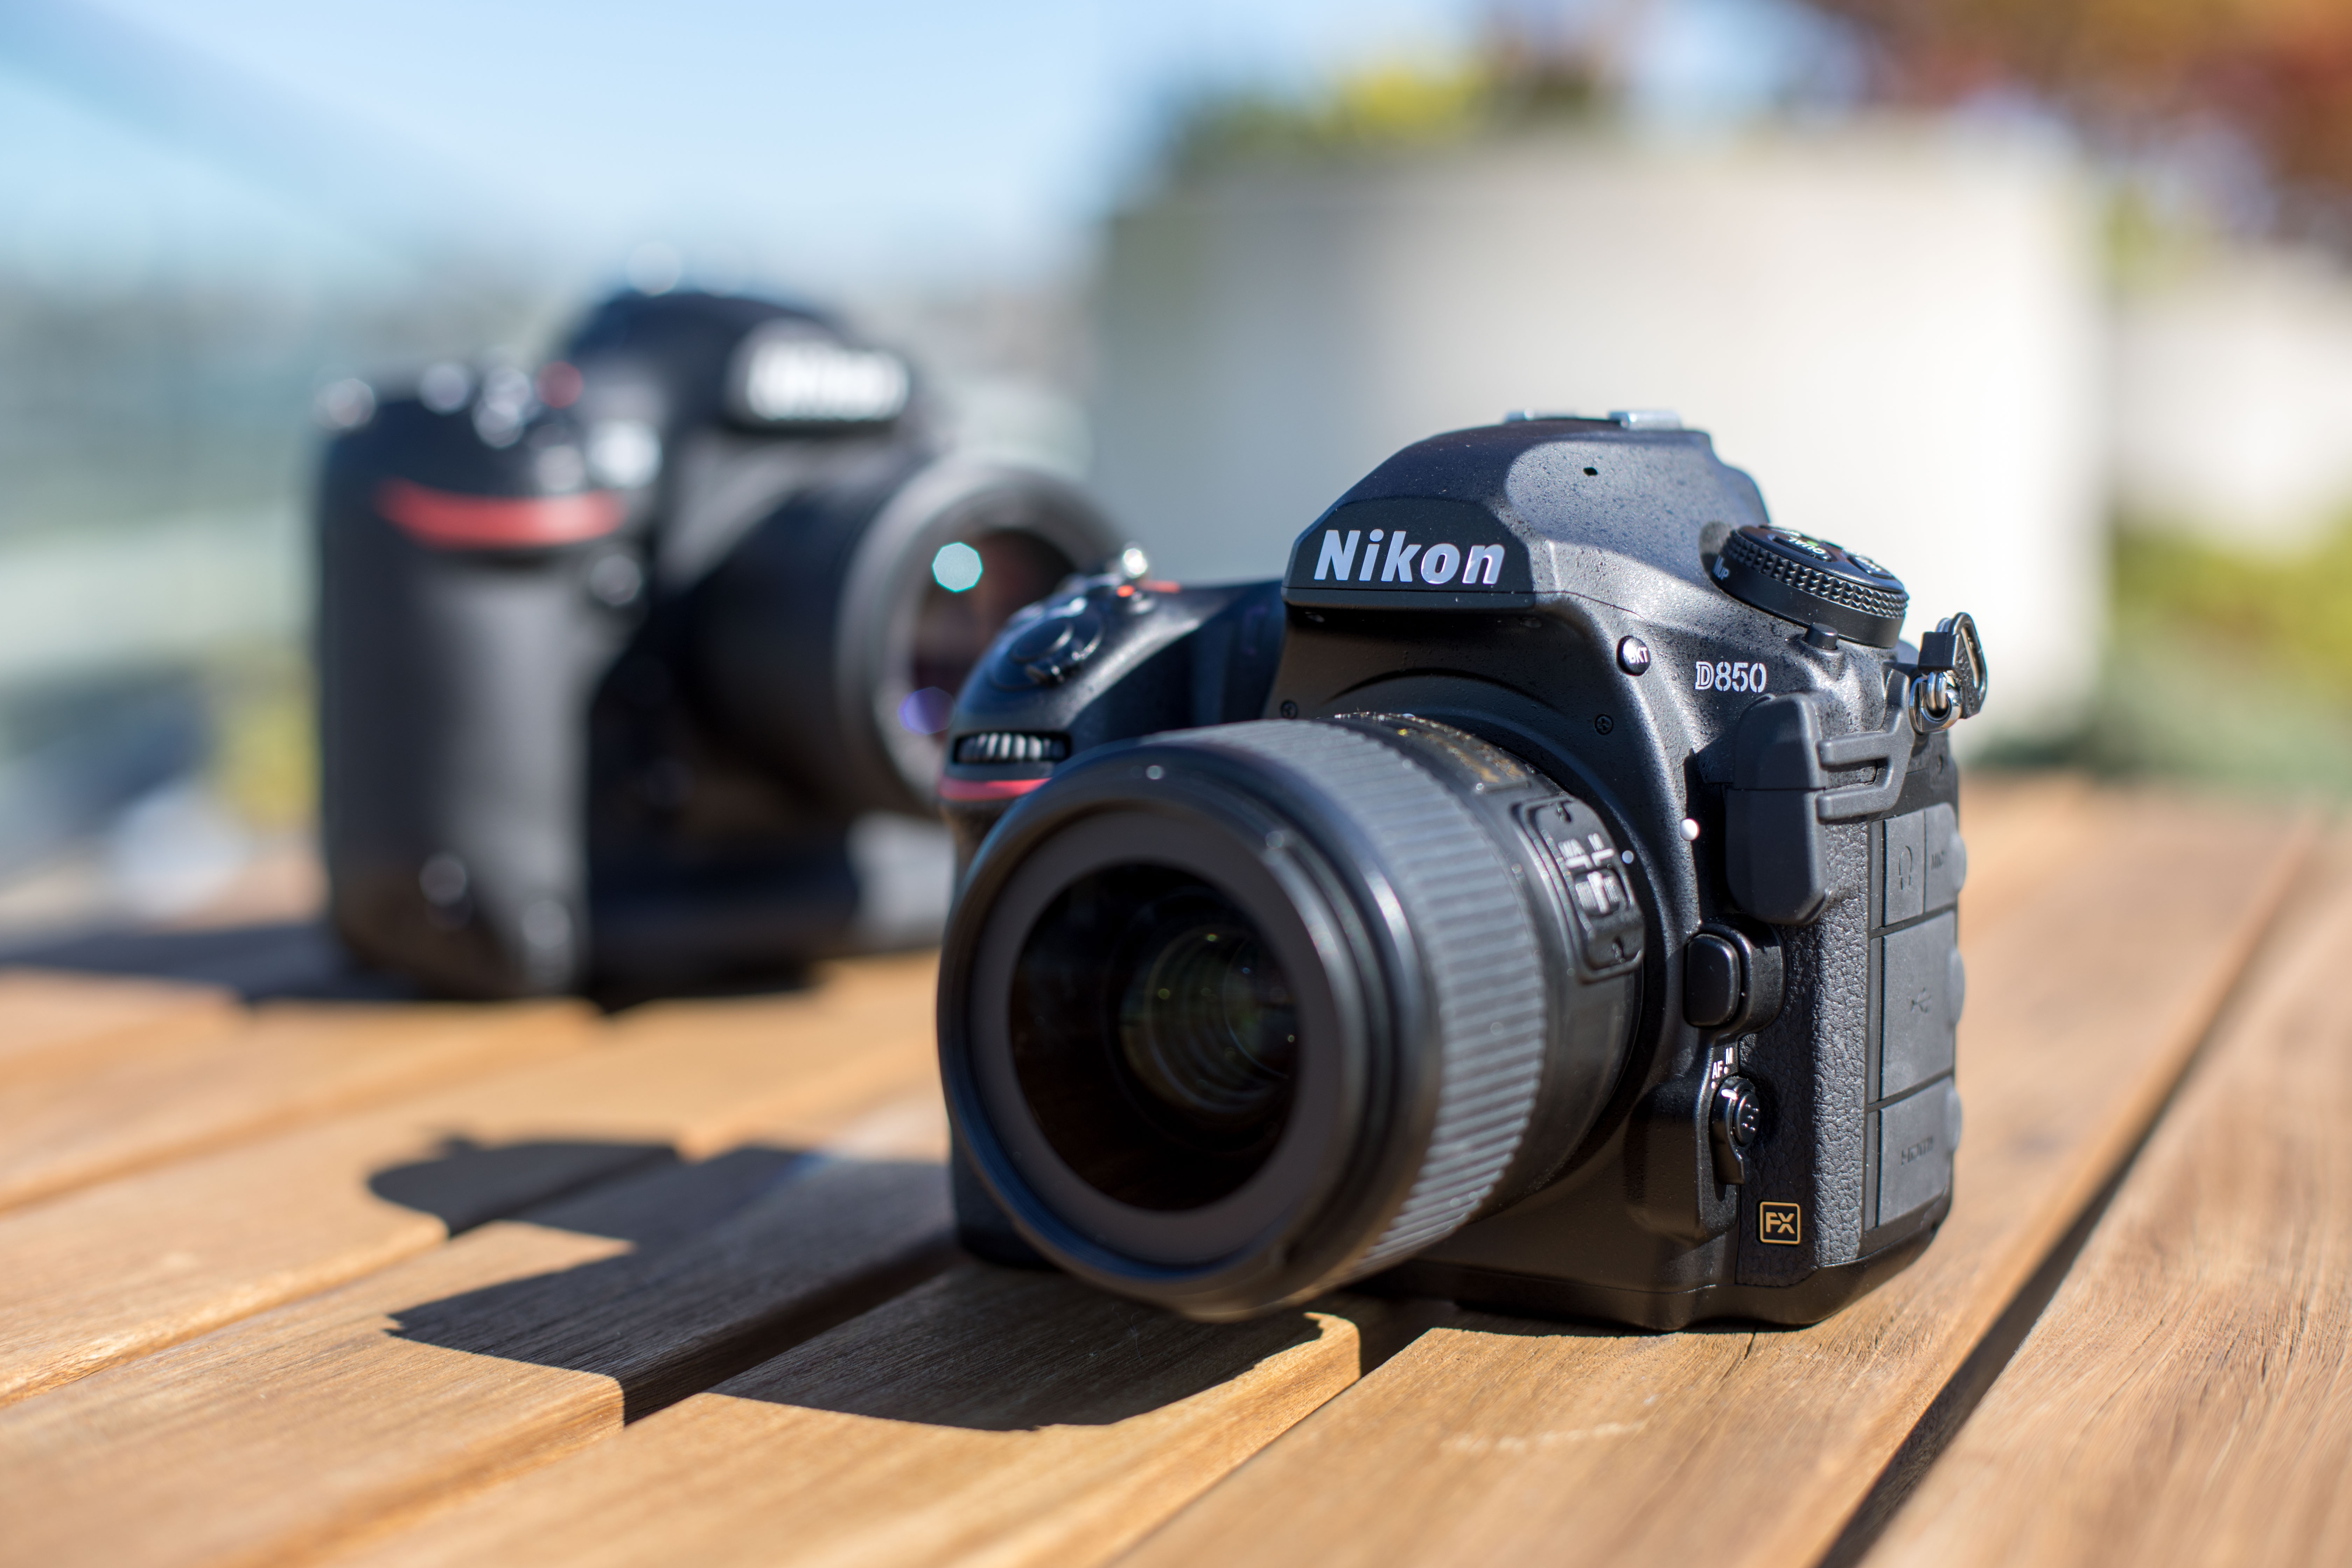 Not quite as good? Nikon D850 versus Nikon D5 subject tracking ...